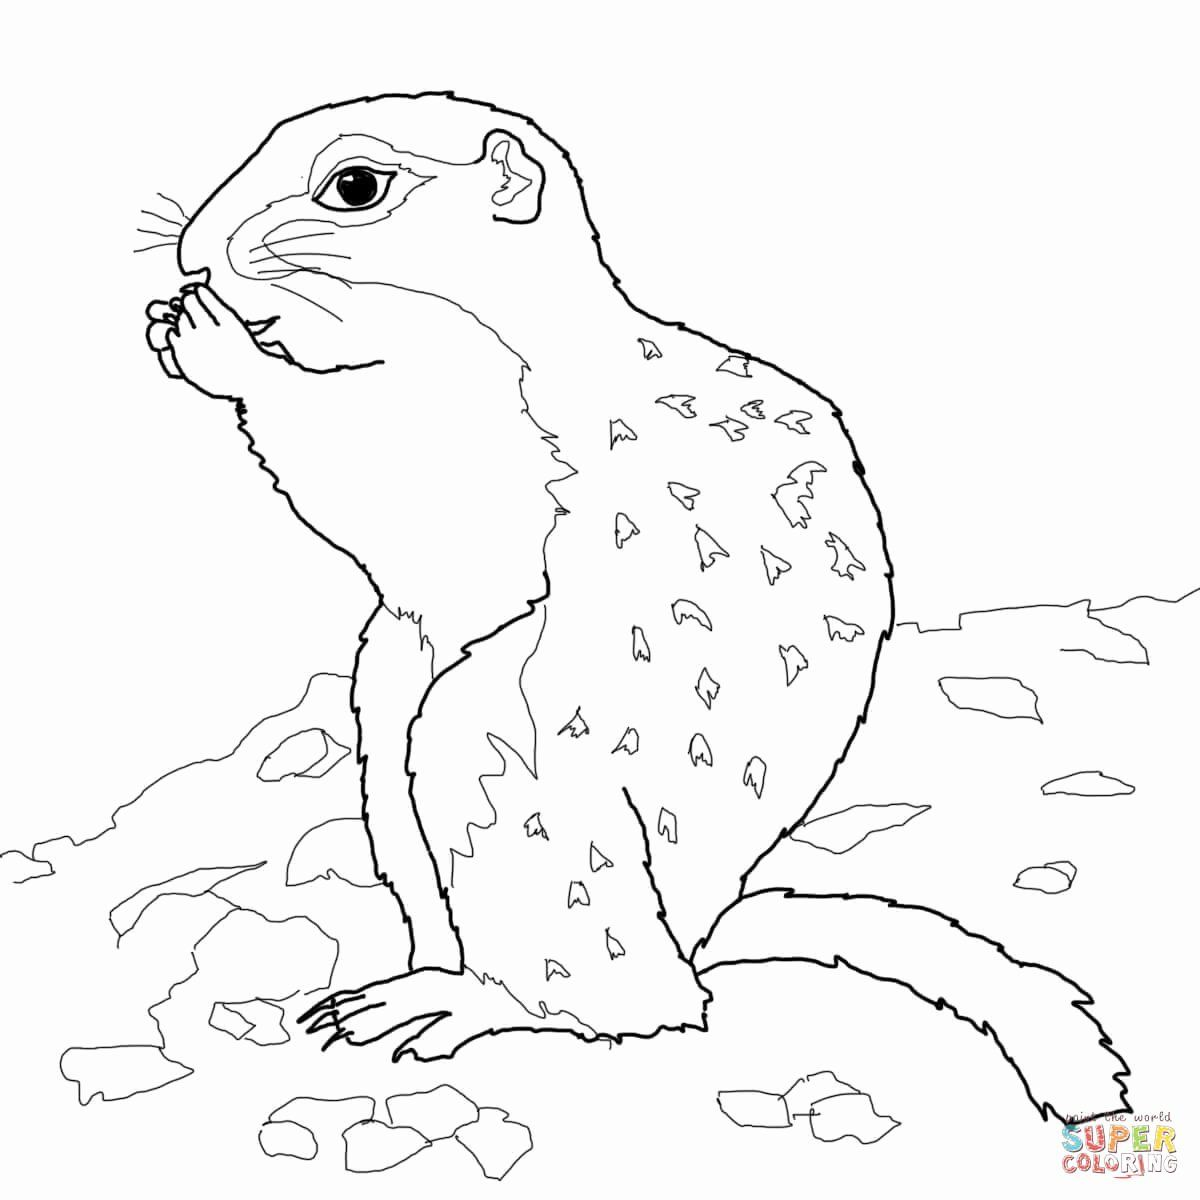 Groundhog Day Coloring Sheet Dengan Gambar